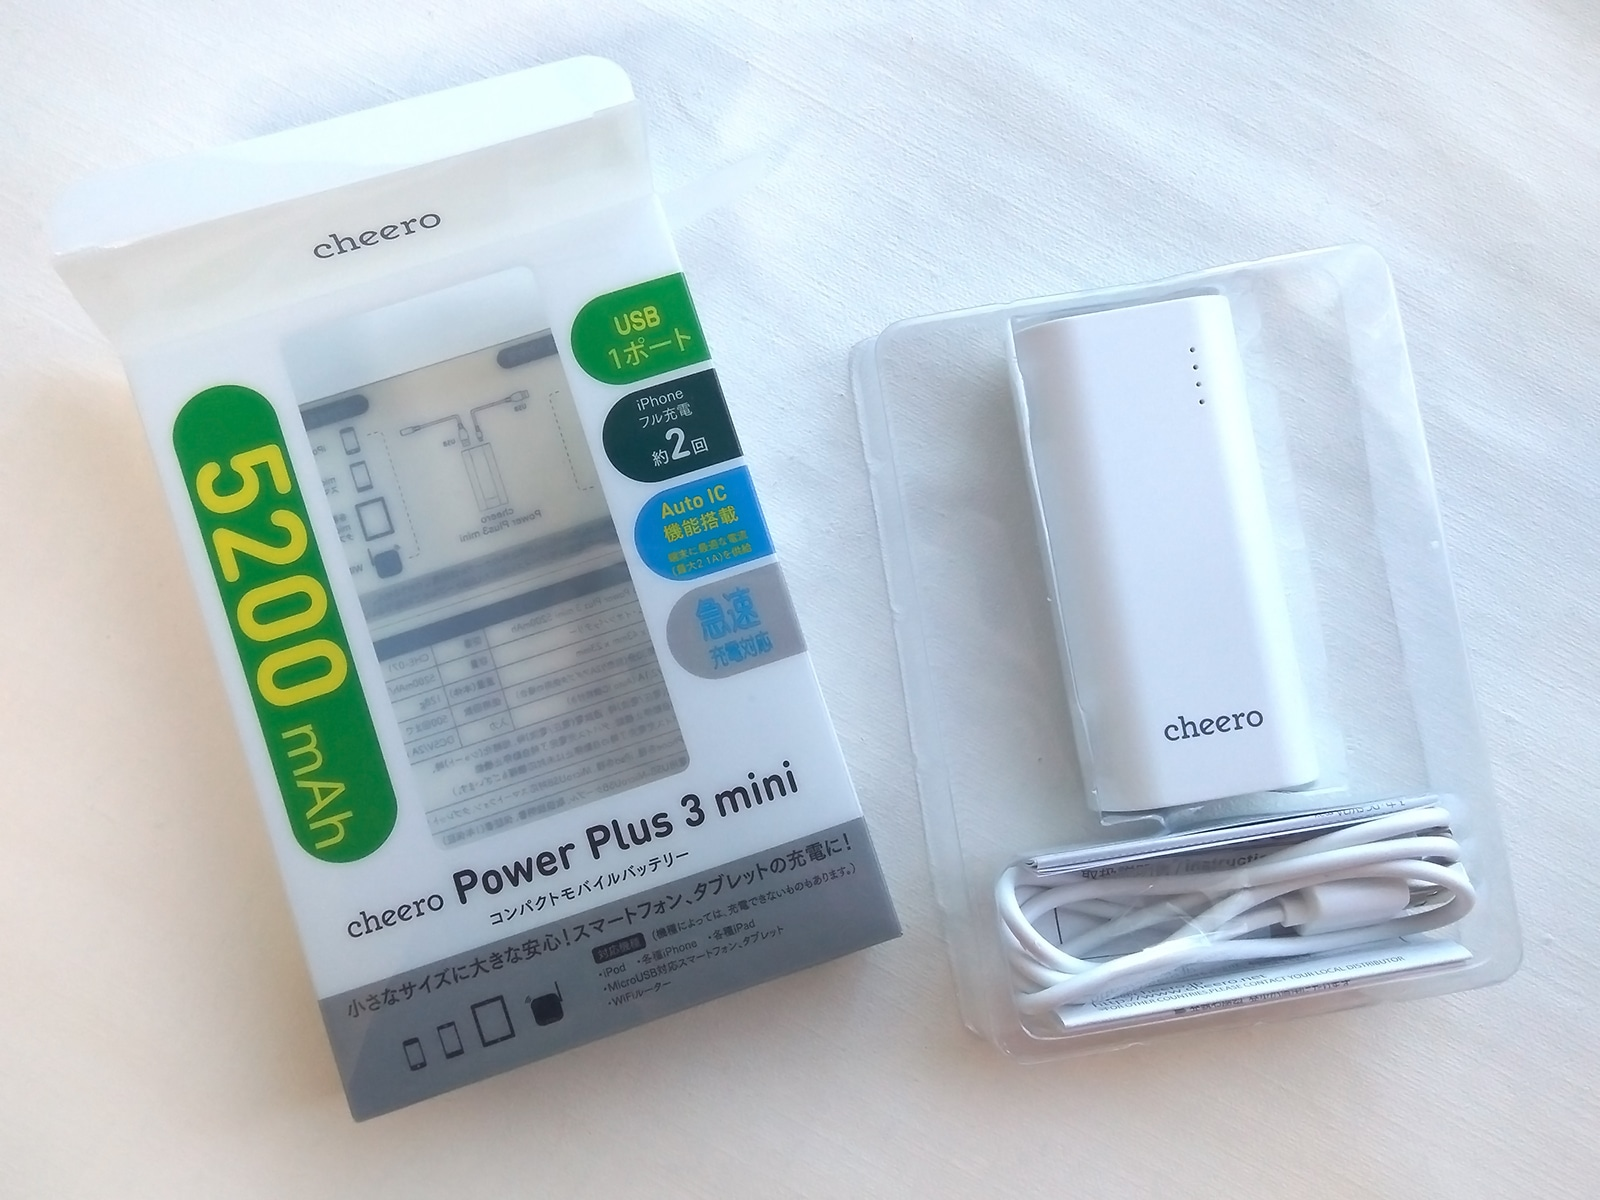 cheero Power Plus 3 mini 5200mAh 開封